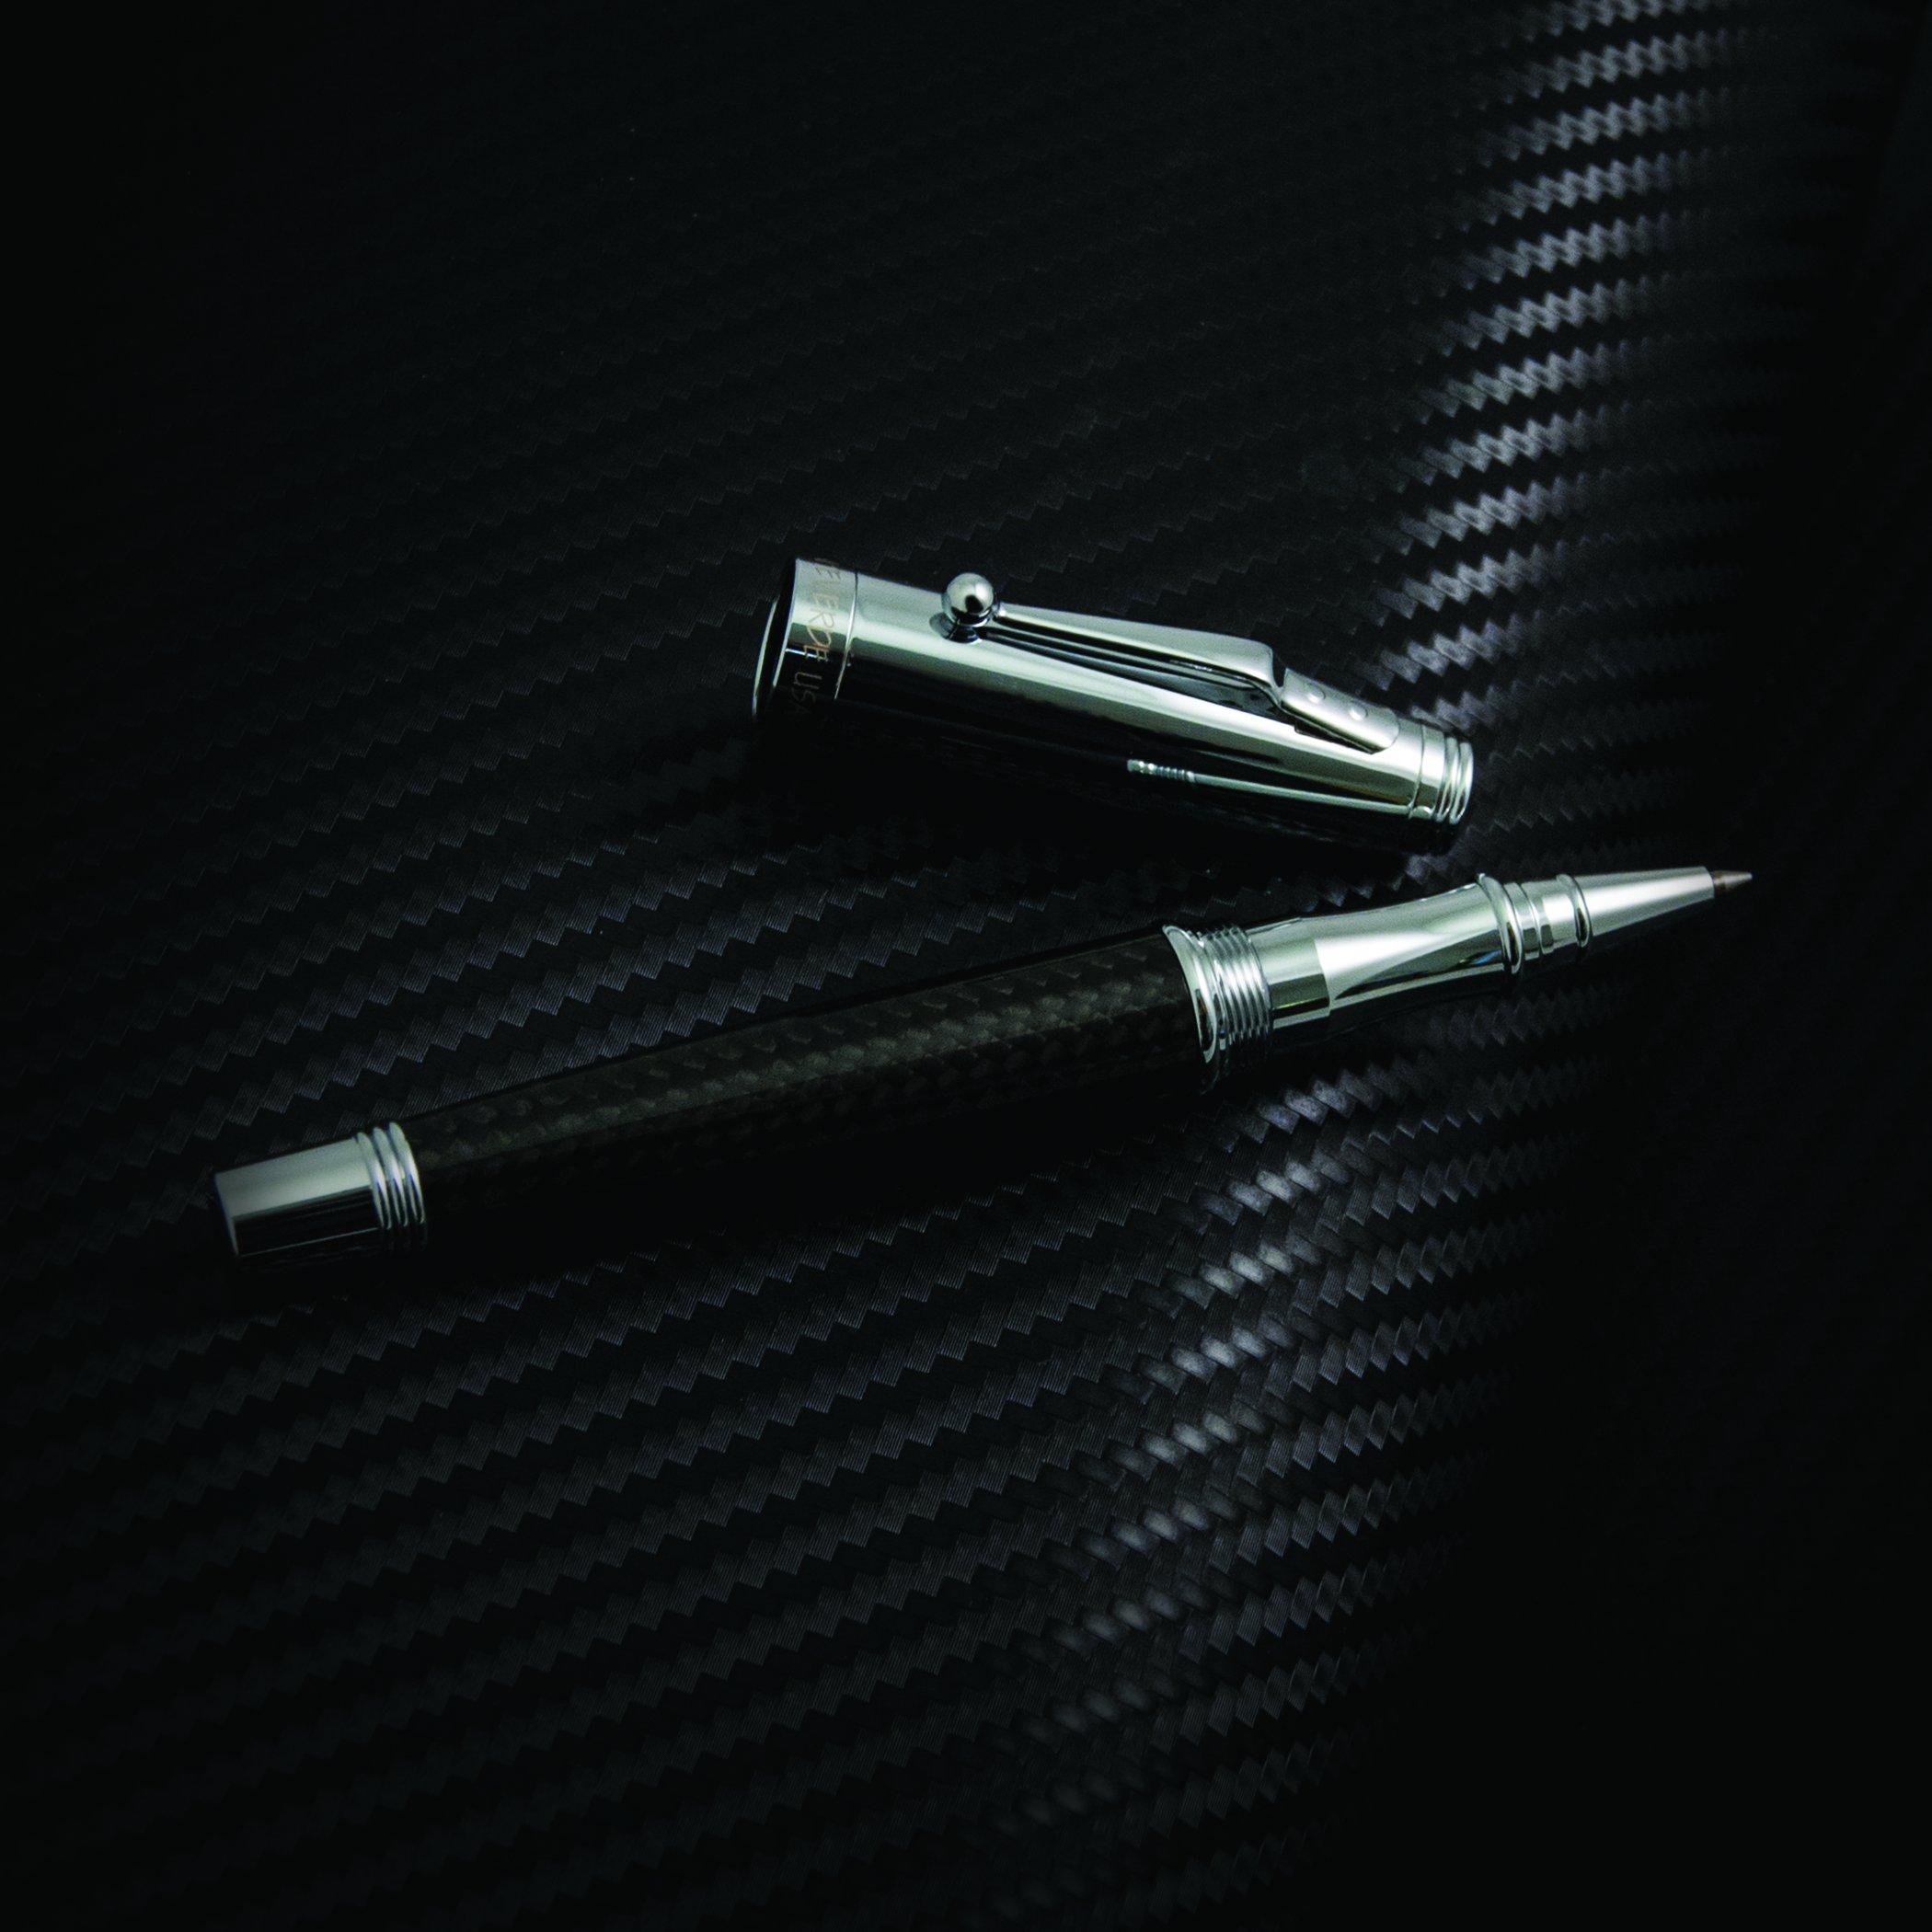 Monteverde Invincia Rollerball Pen, Chrome with Black Carbon Fiber (MV40064) by Monteverde (Image #8)